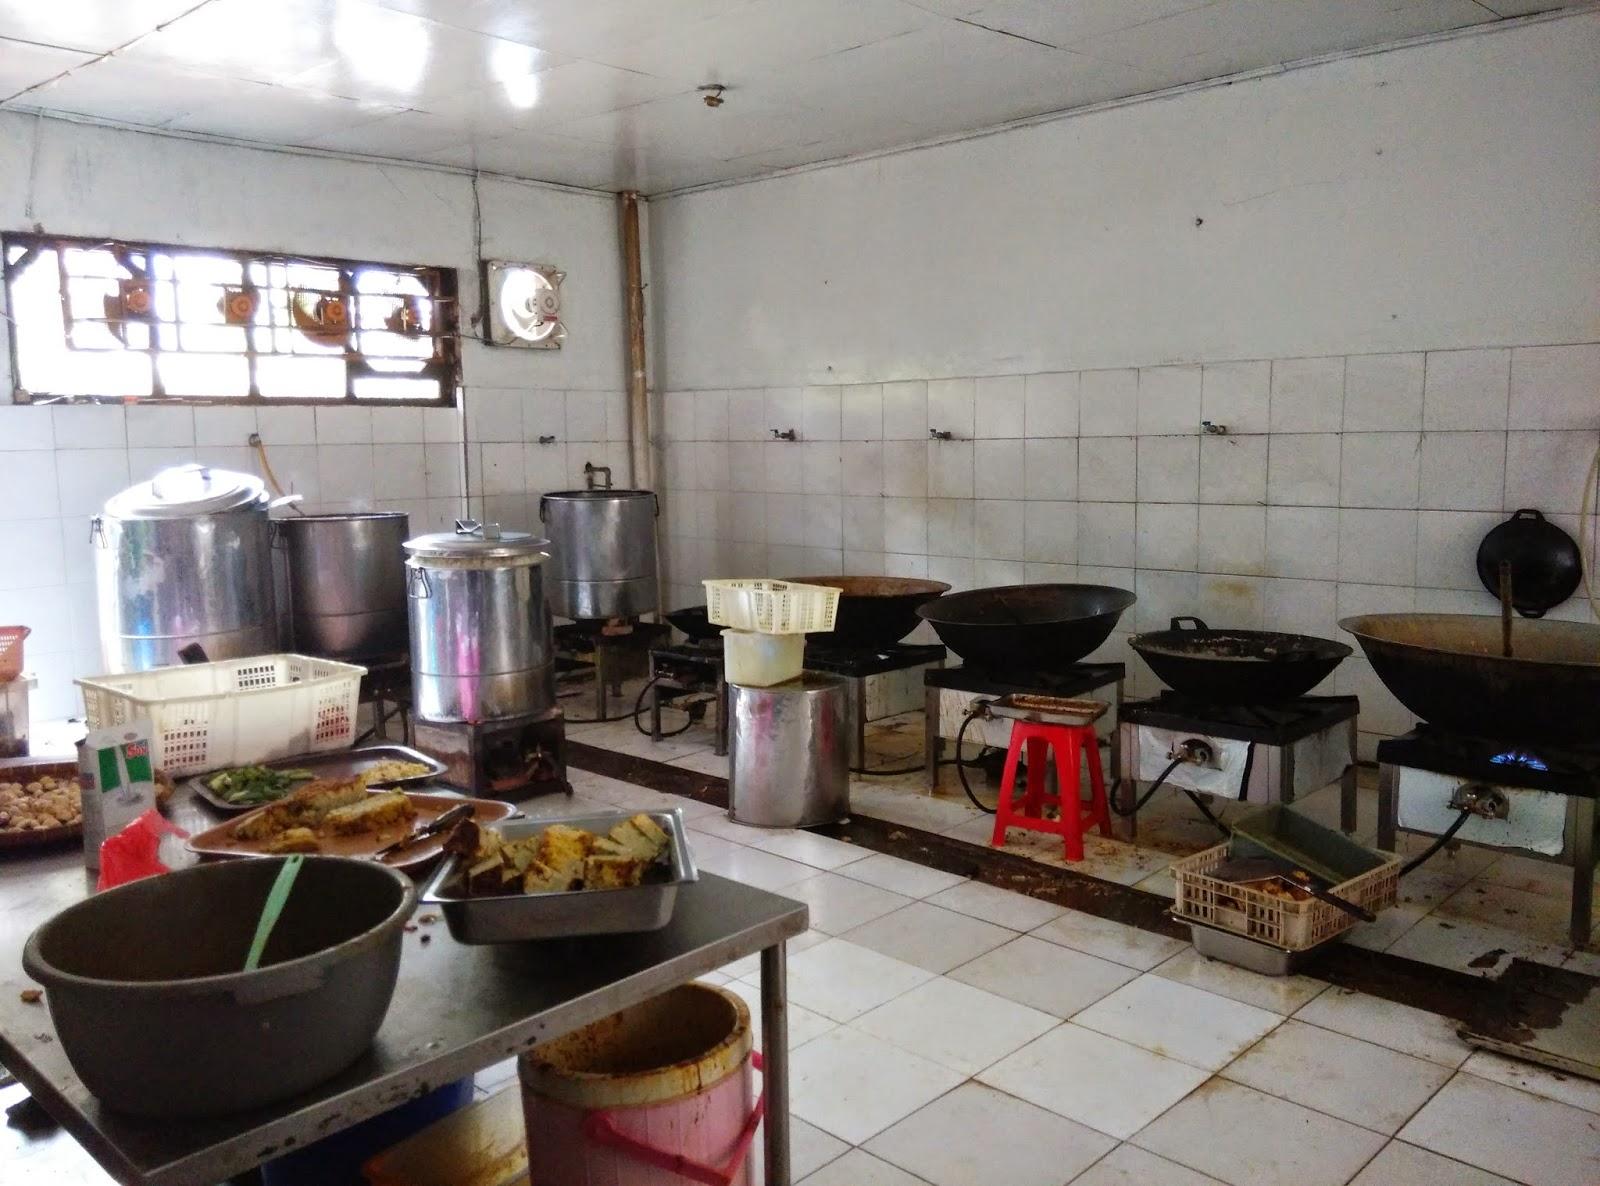 INDO CATERING - (5) 5: Renovasi Dapur